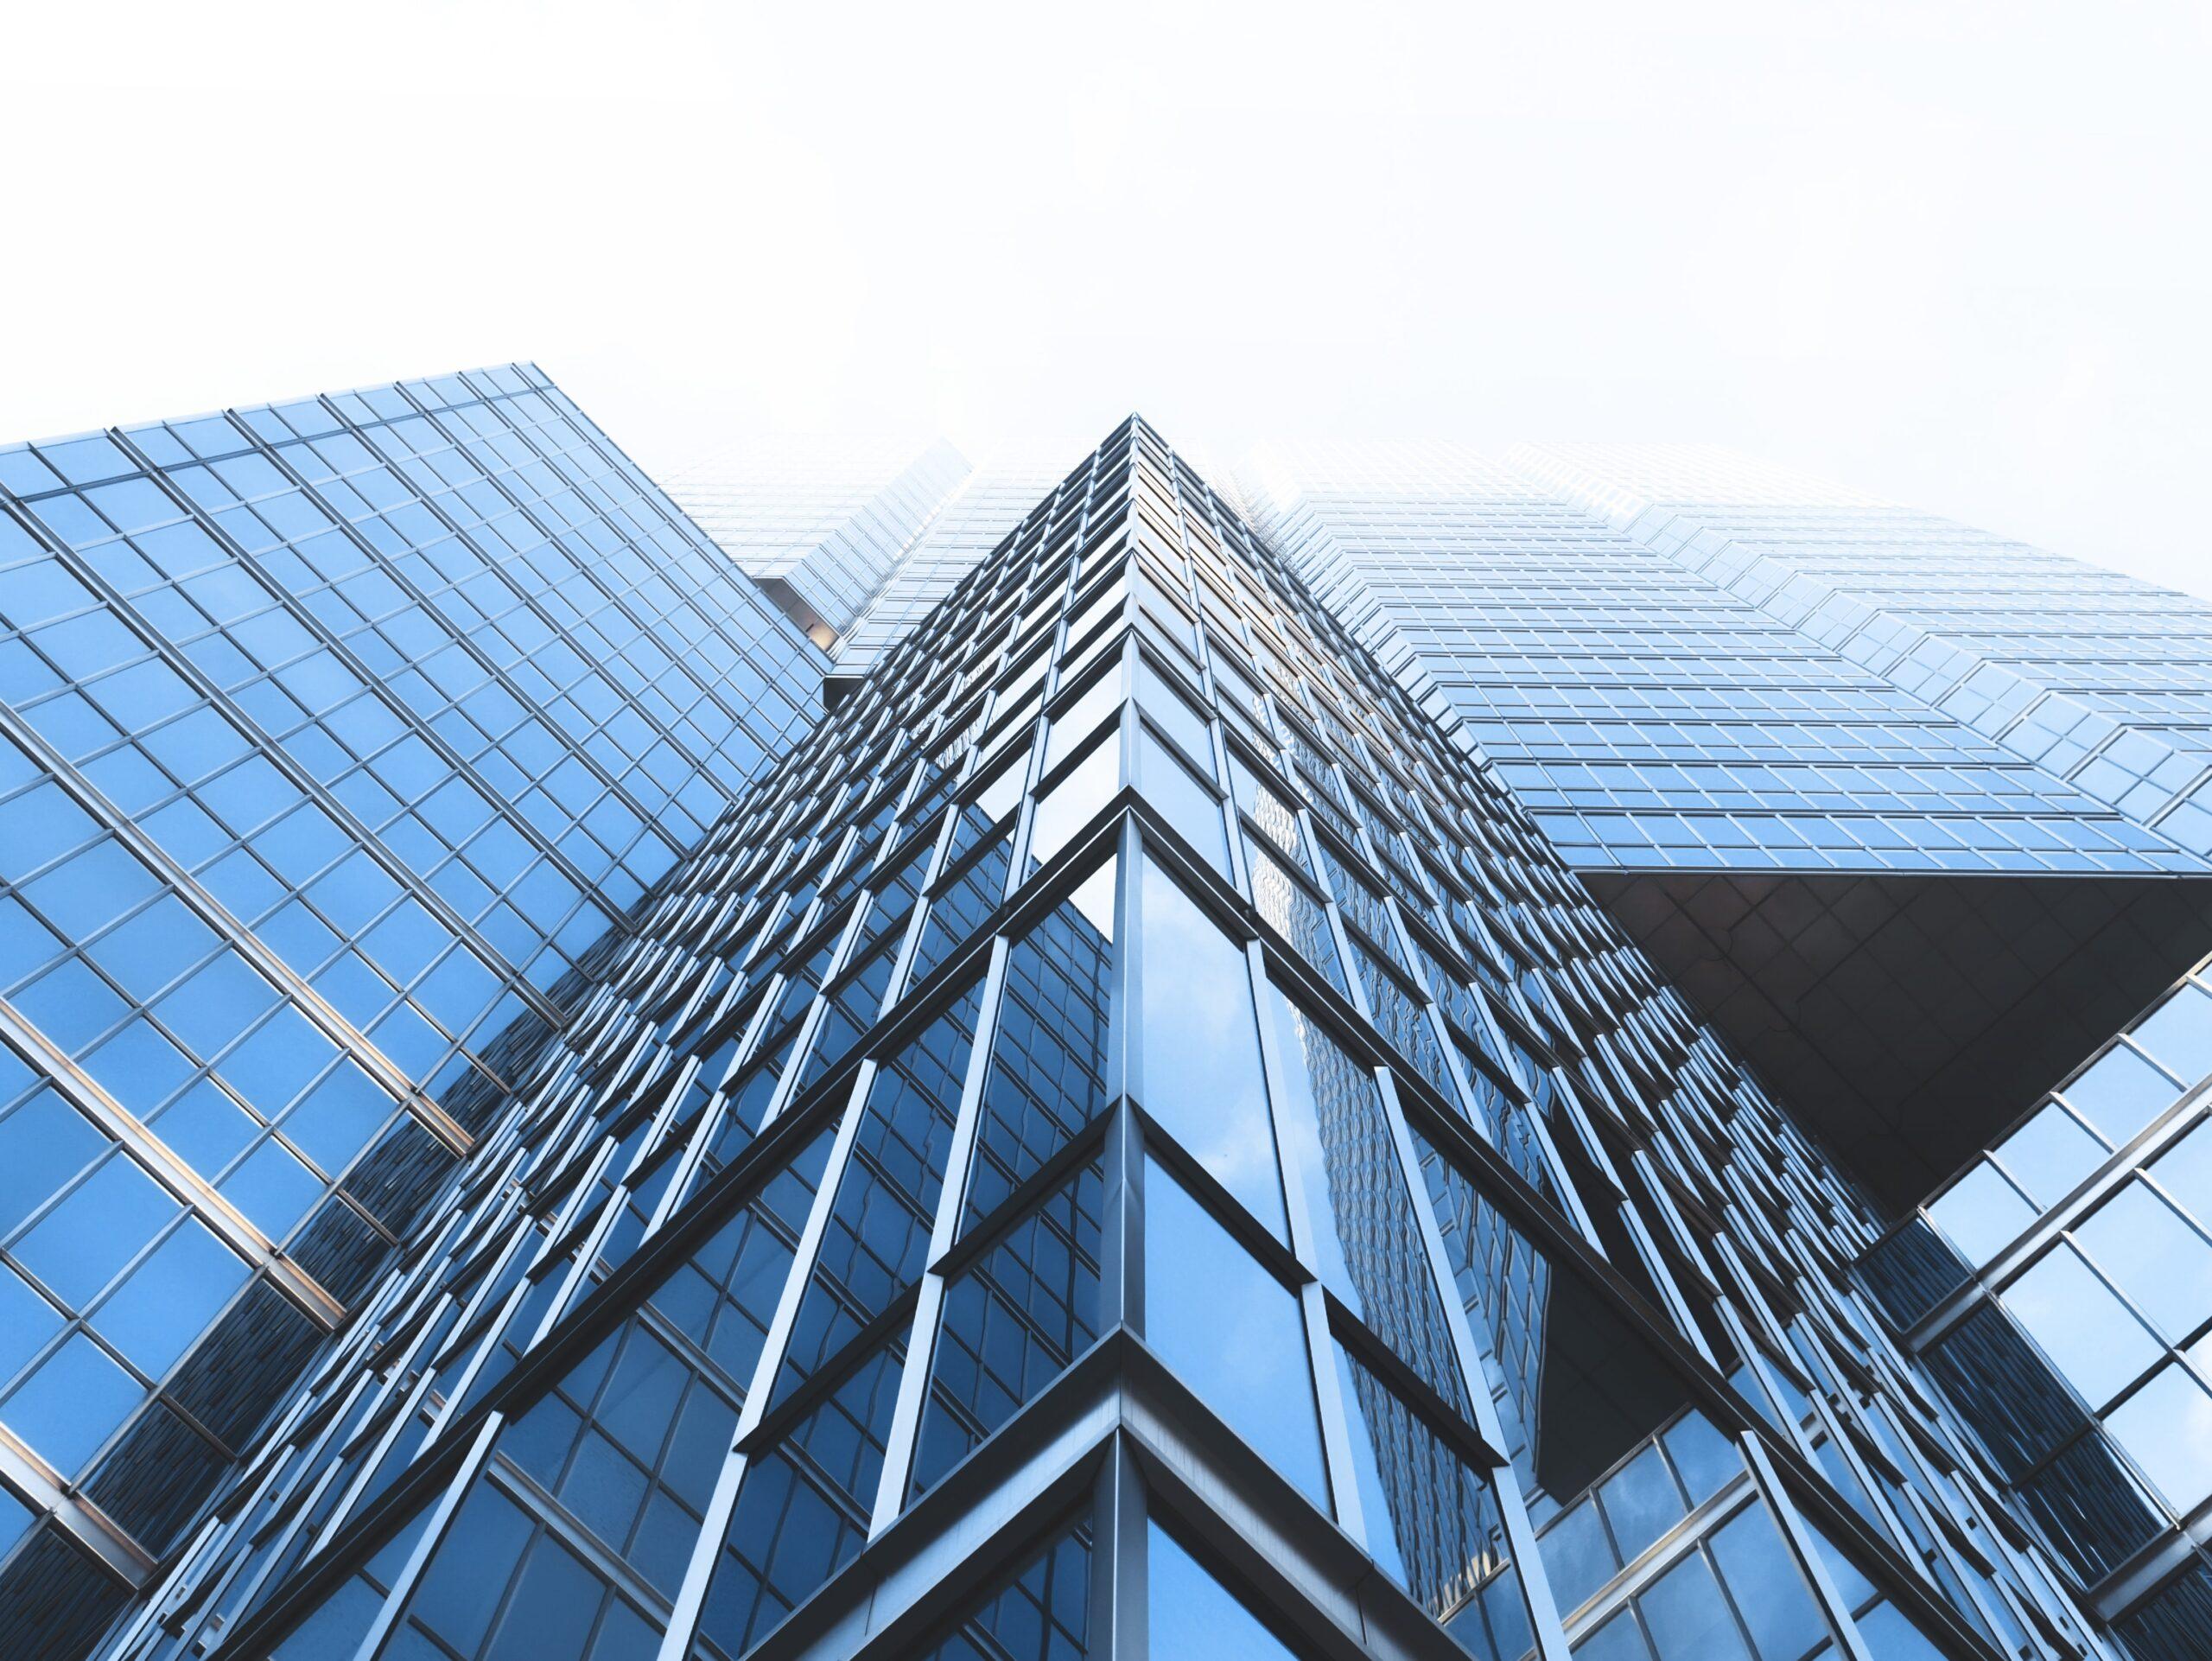 Facade Building Waterproofing